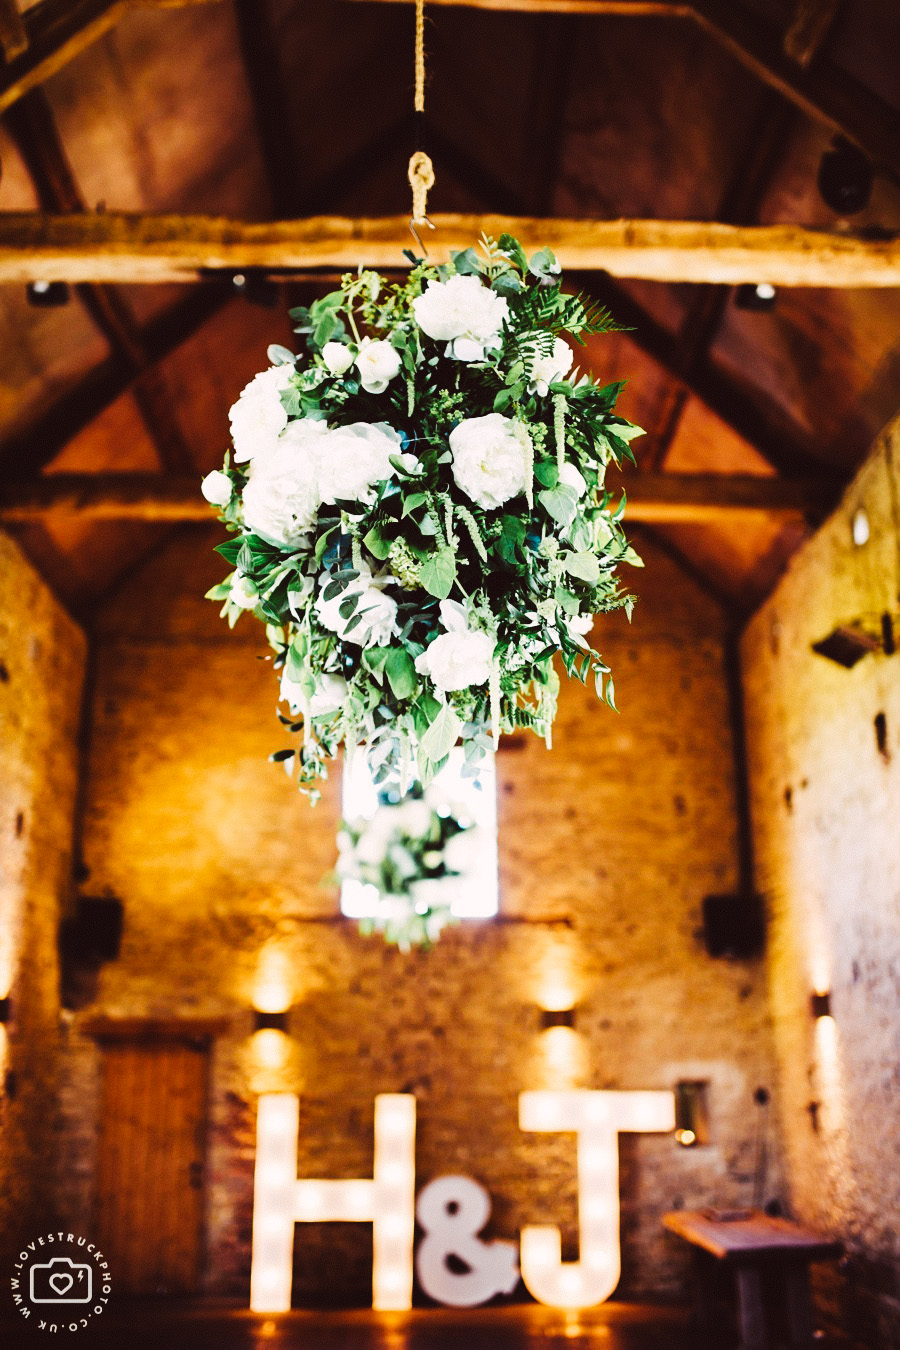 cripps barn wedding photography, oxfordshire wedding photography